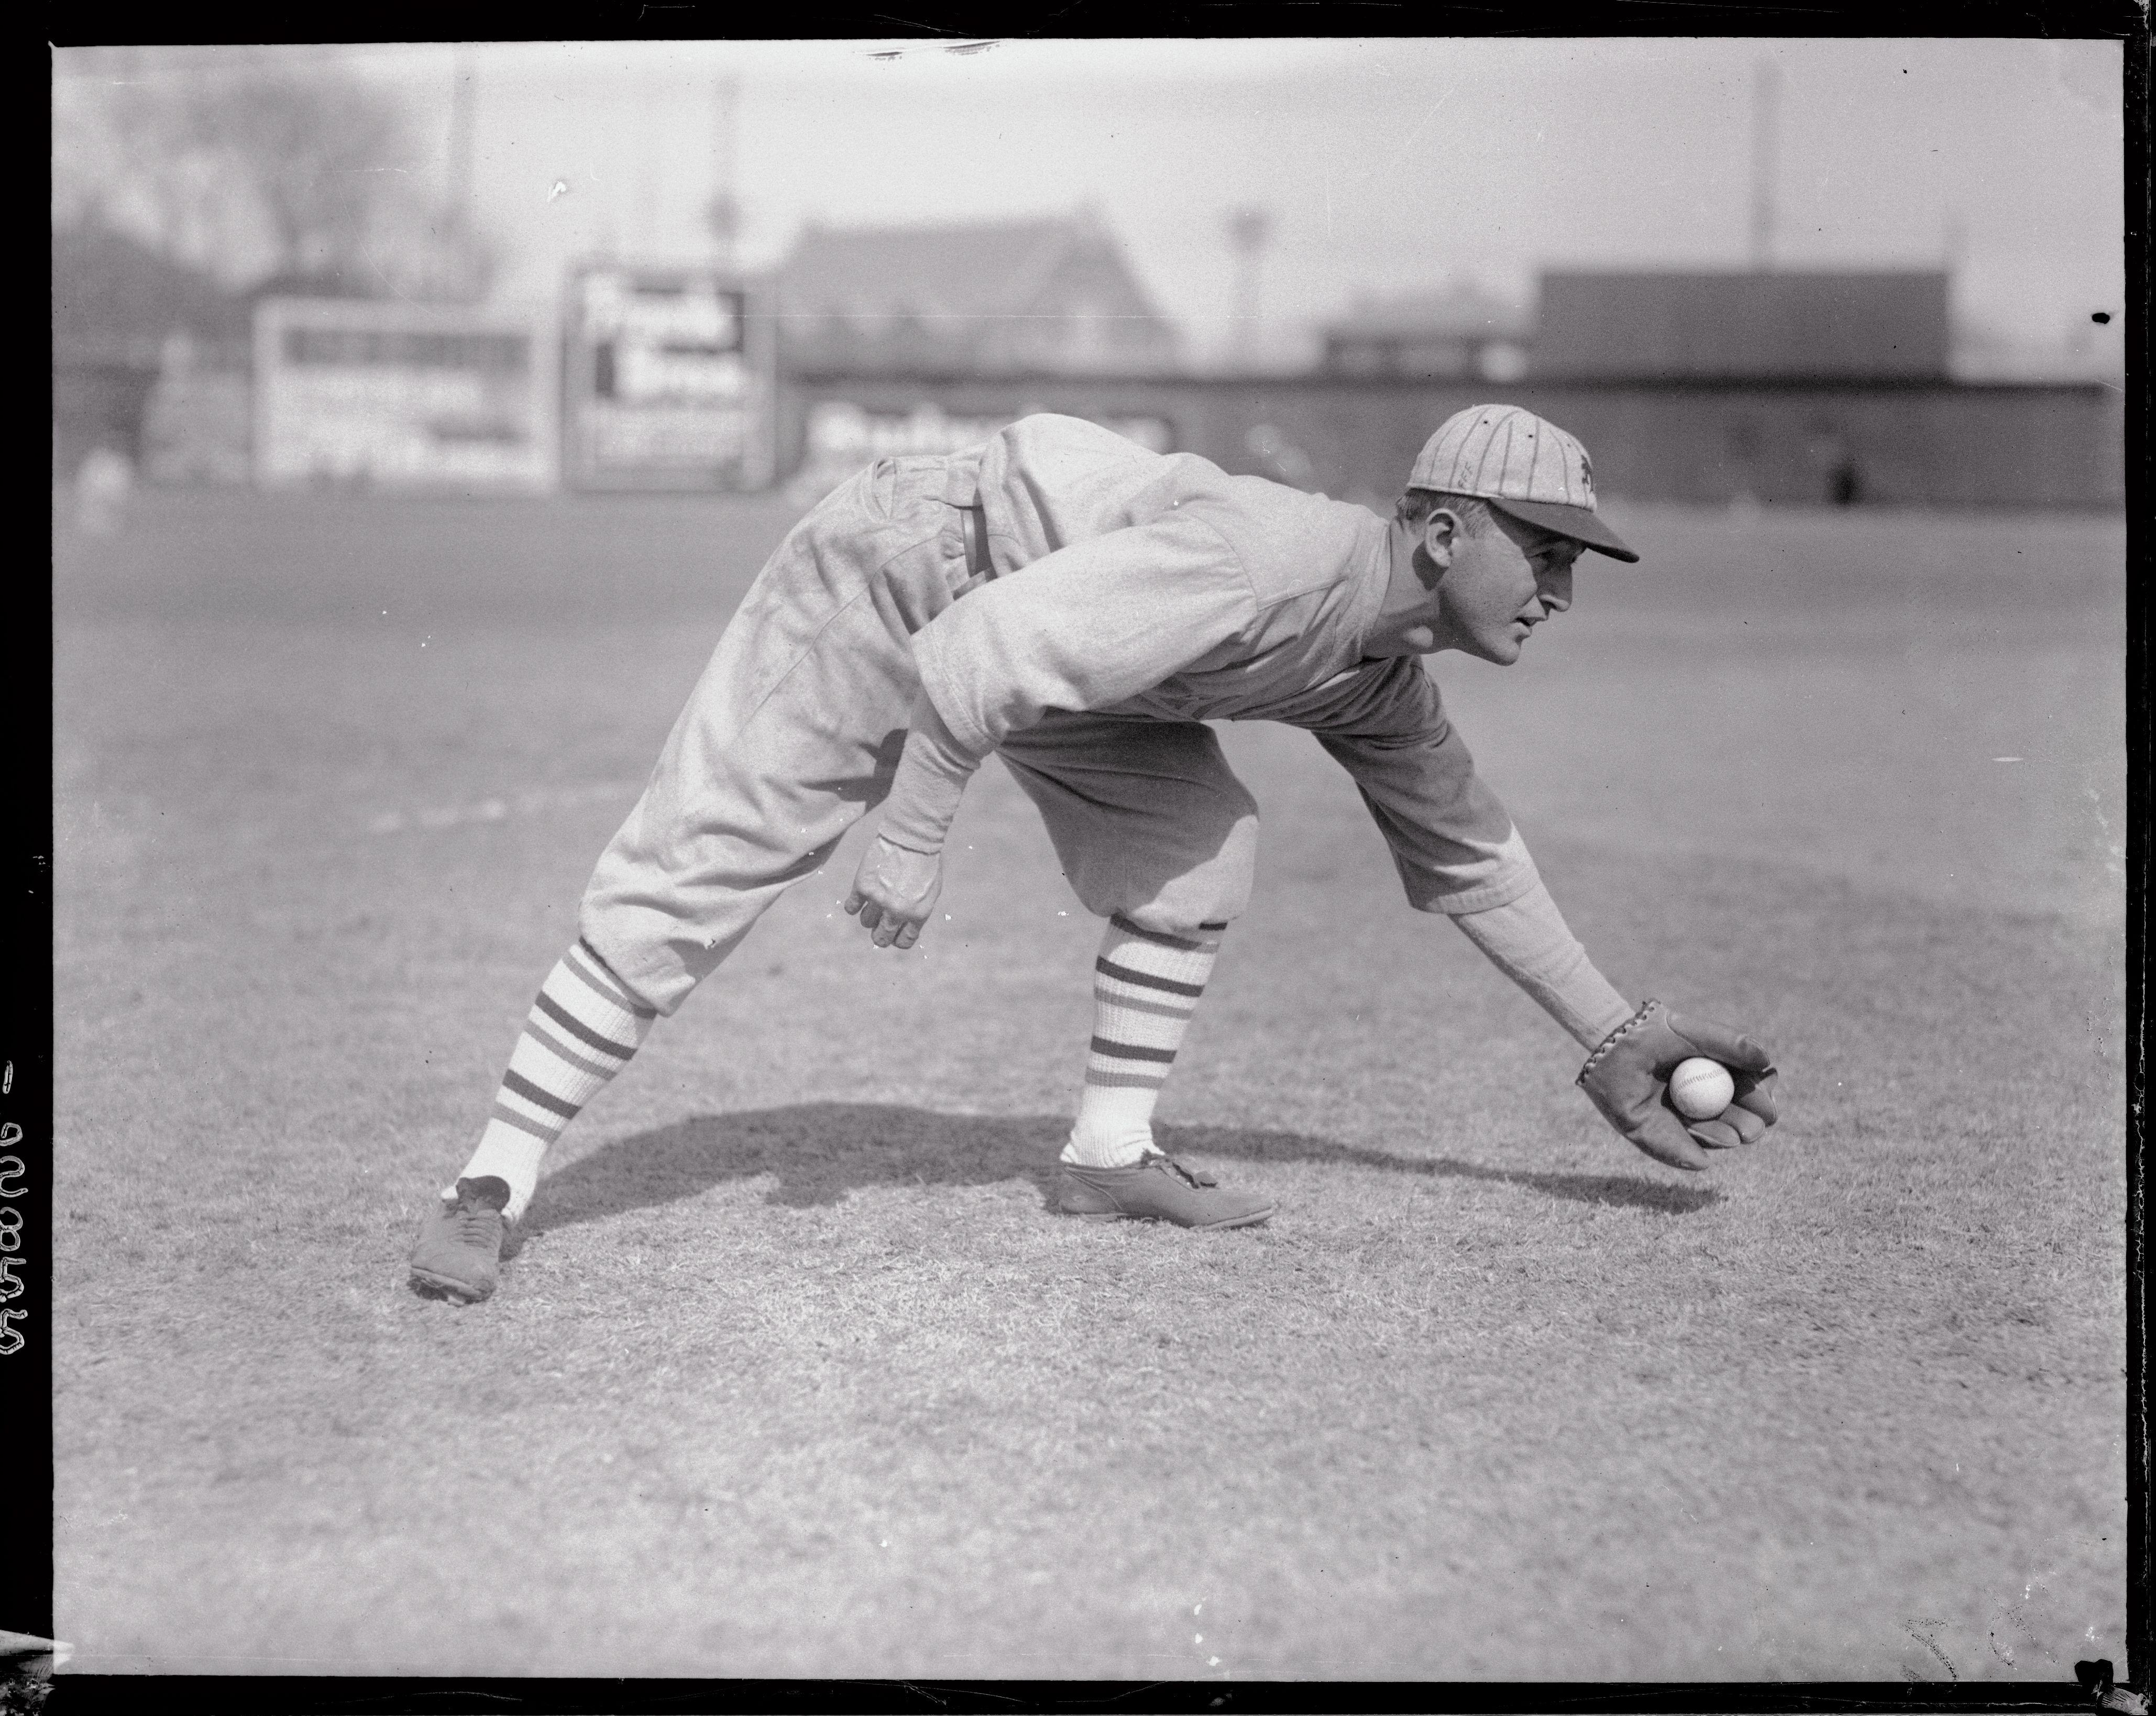 Frank Frisch Catching Baseball on the Ground